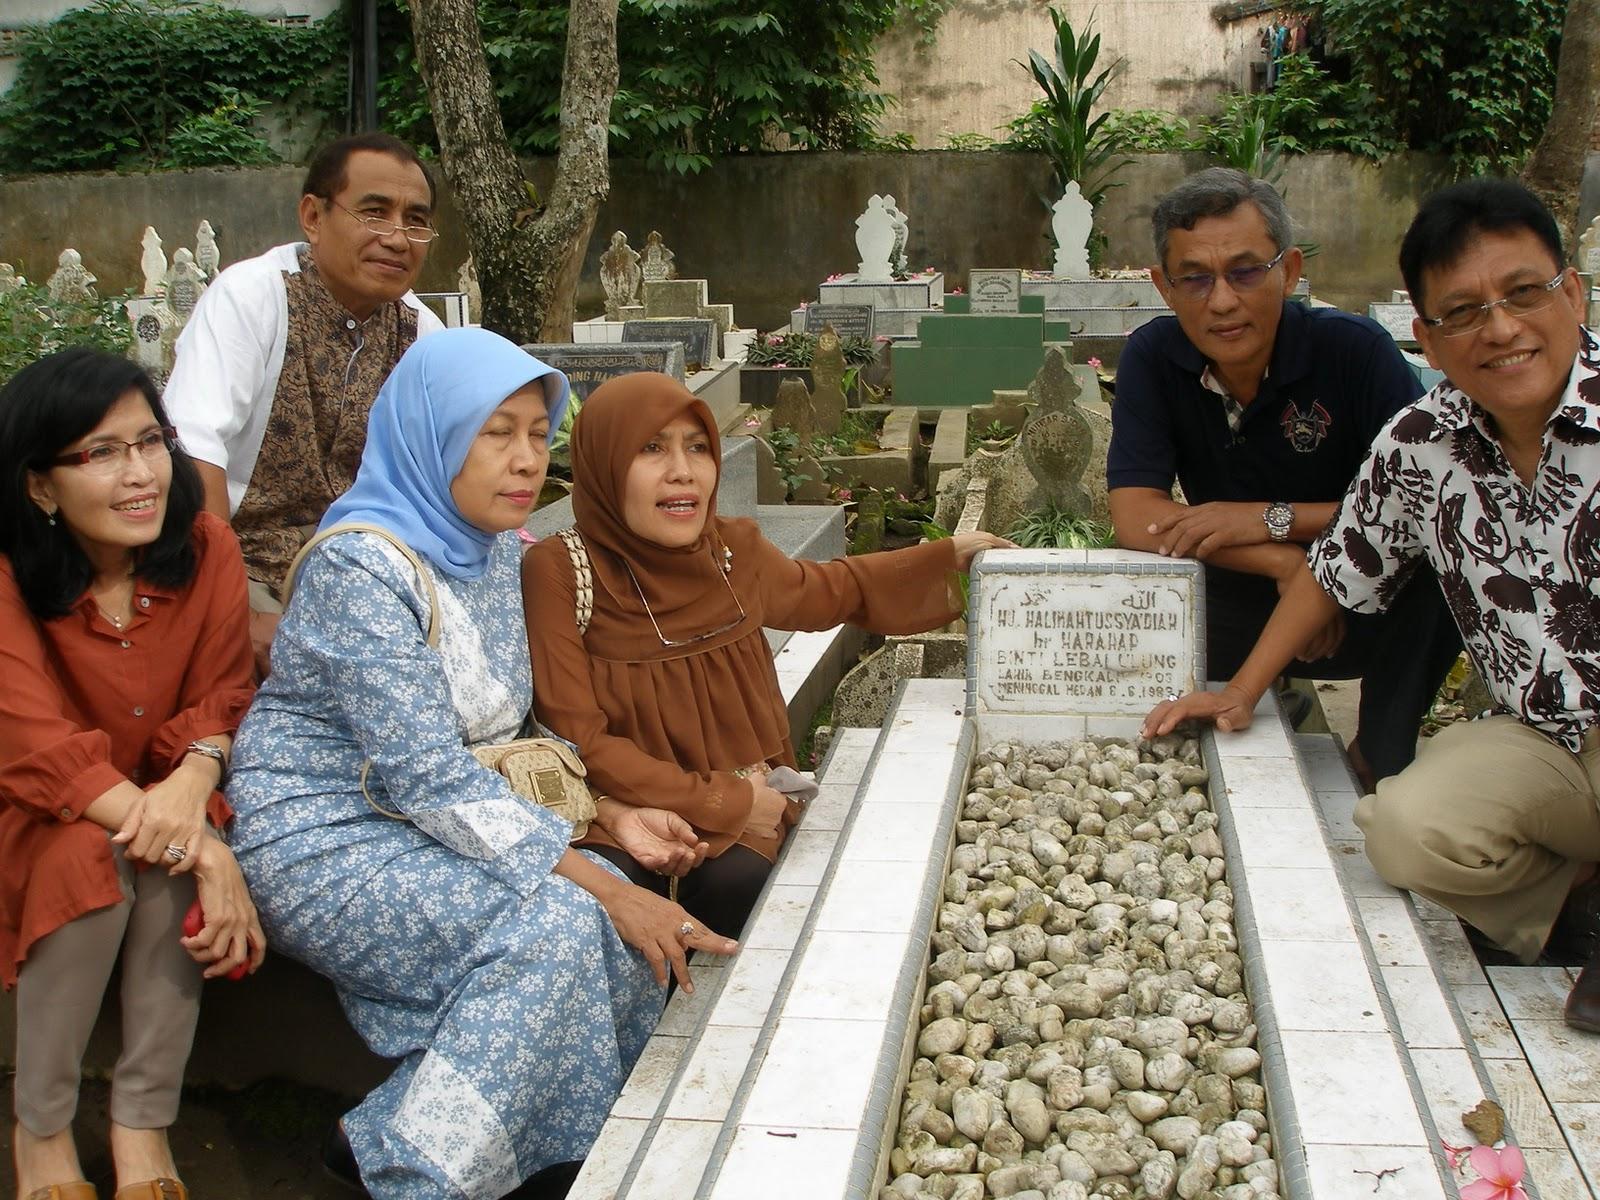 Indah Meitasari From Medan With Love